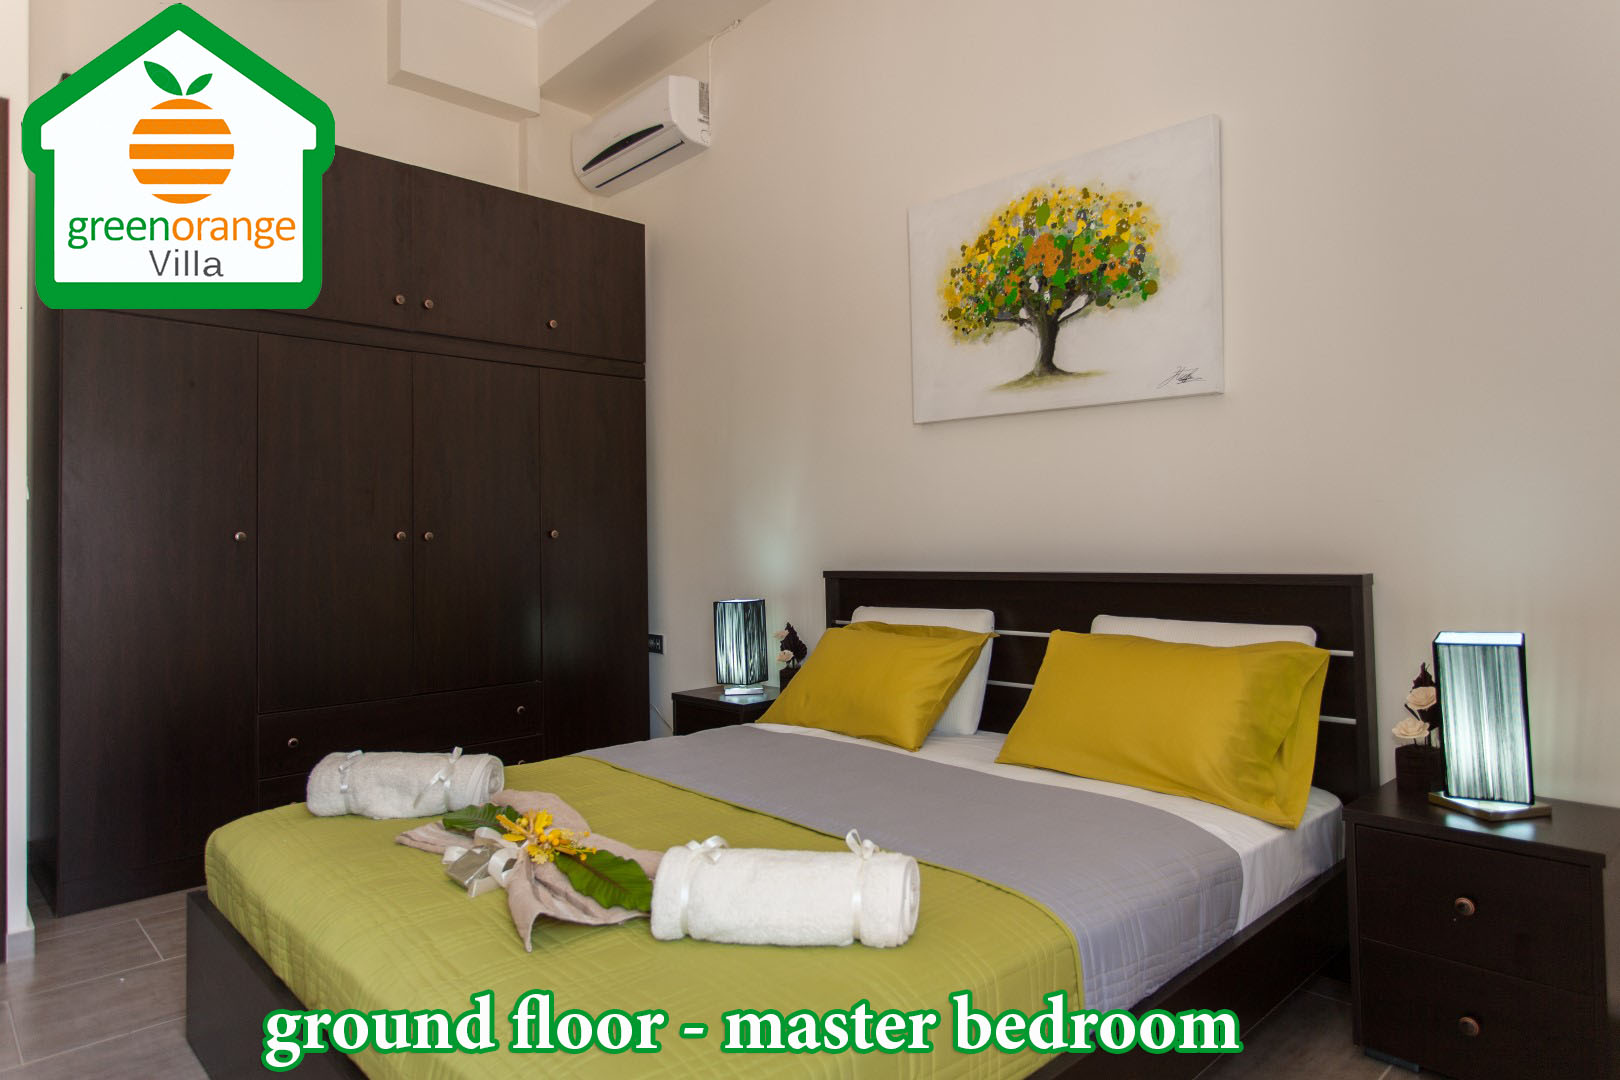 master bedroom for resnt, Green Orange Villa chania Crete Greece, rental home